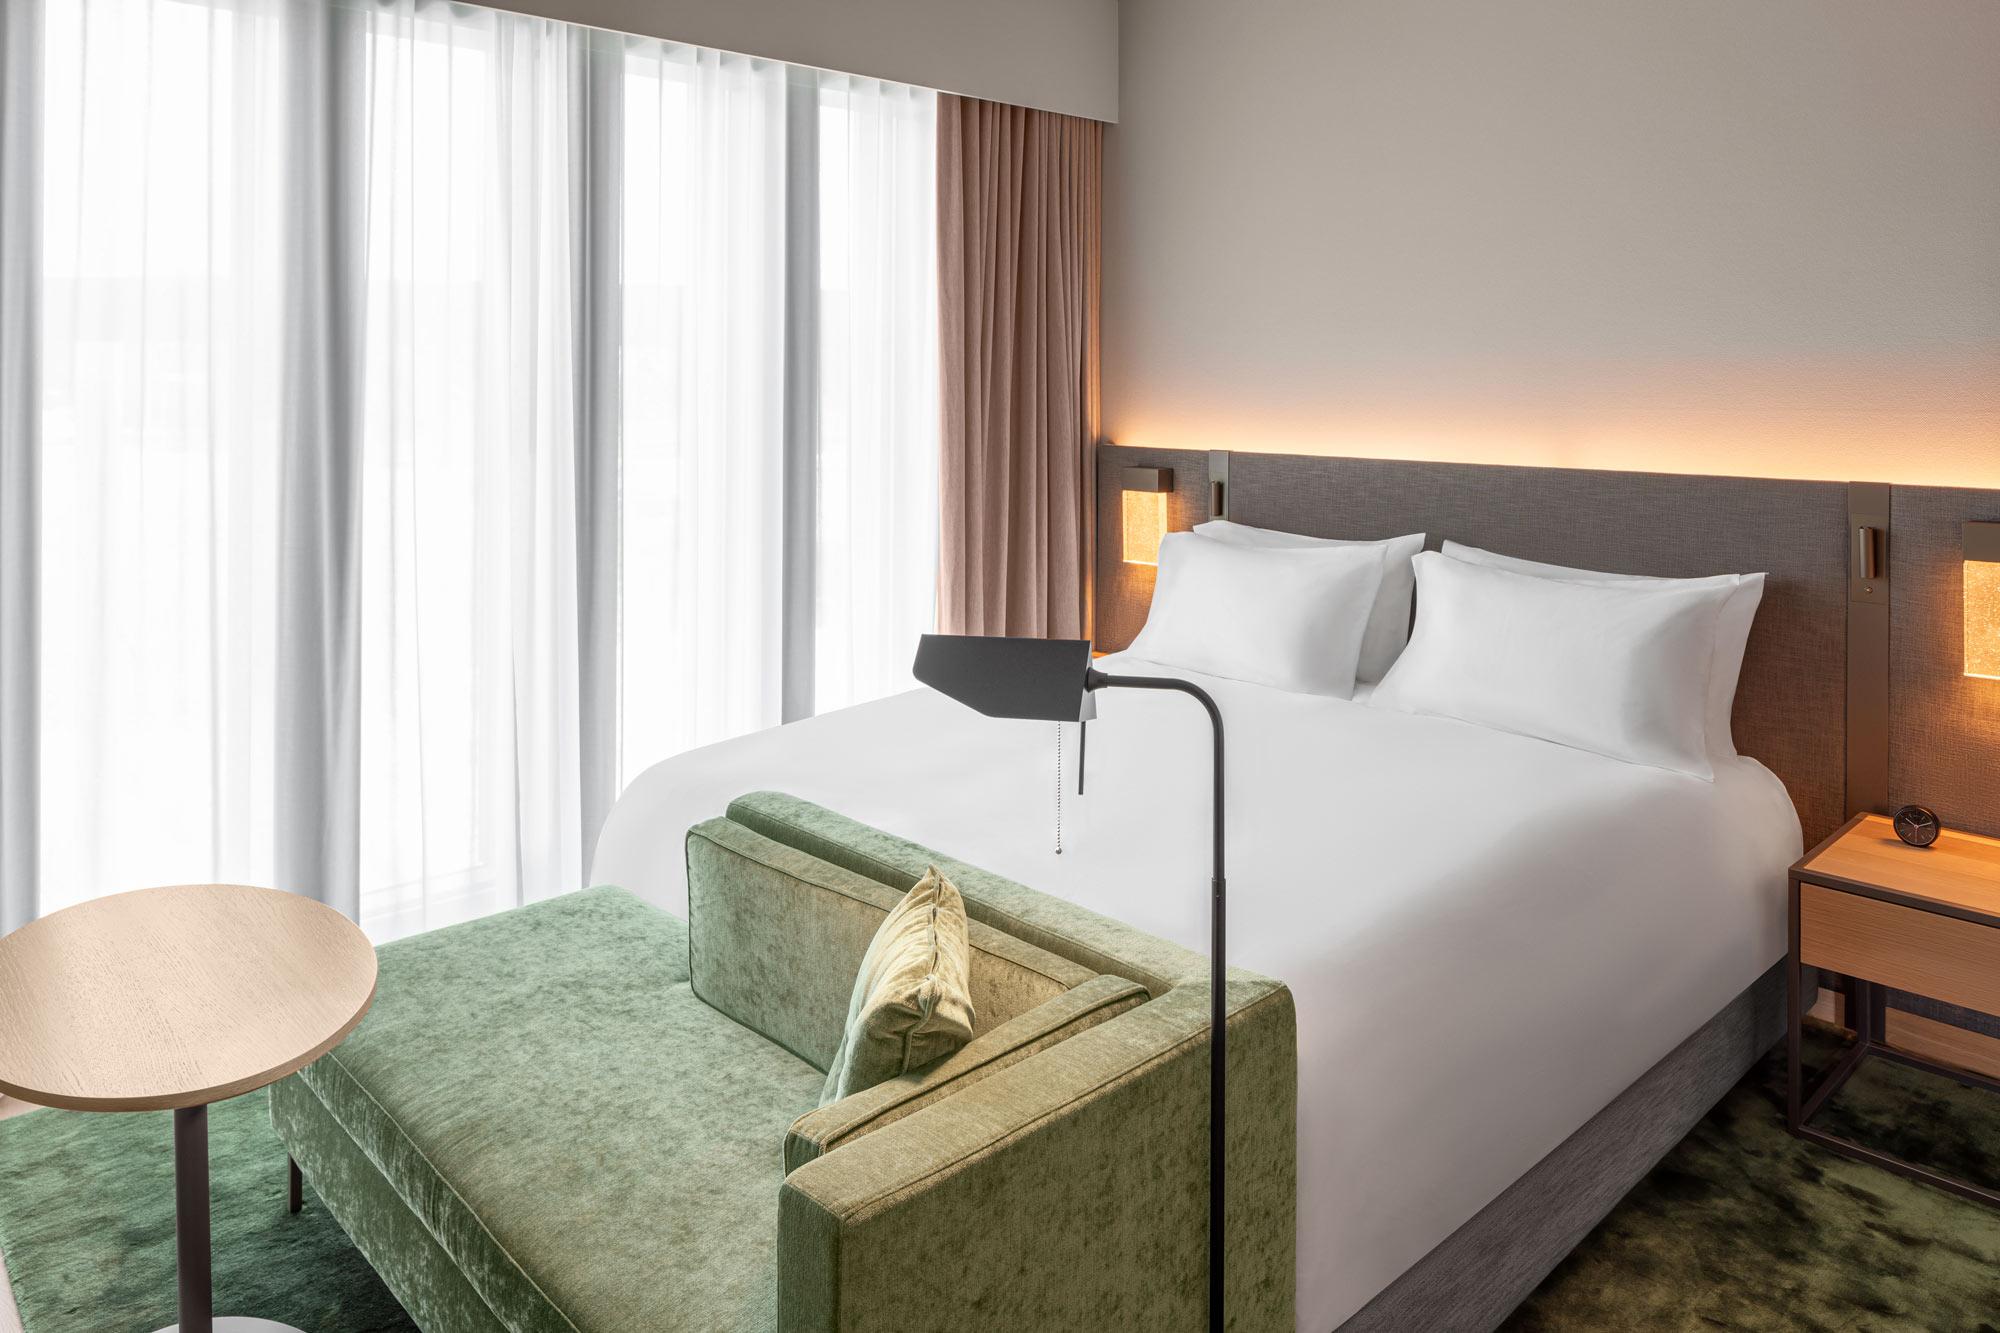 Hyatt Guestroom Hotel Photography by Adrian Kilchherr Switzerland Europe